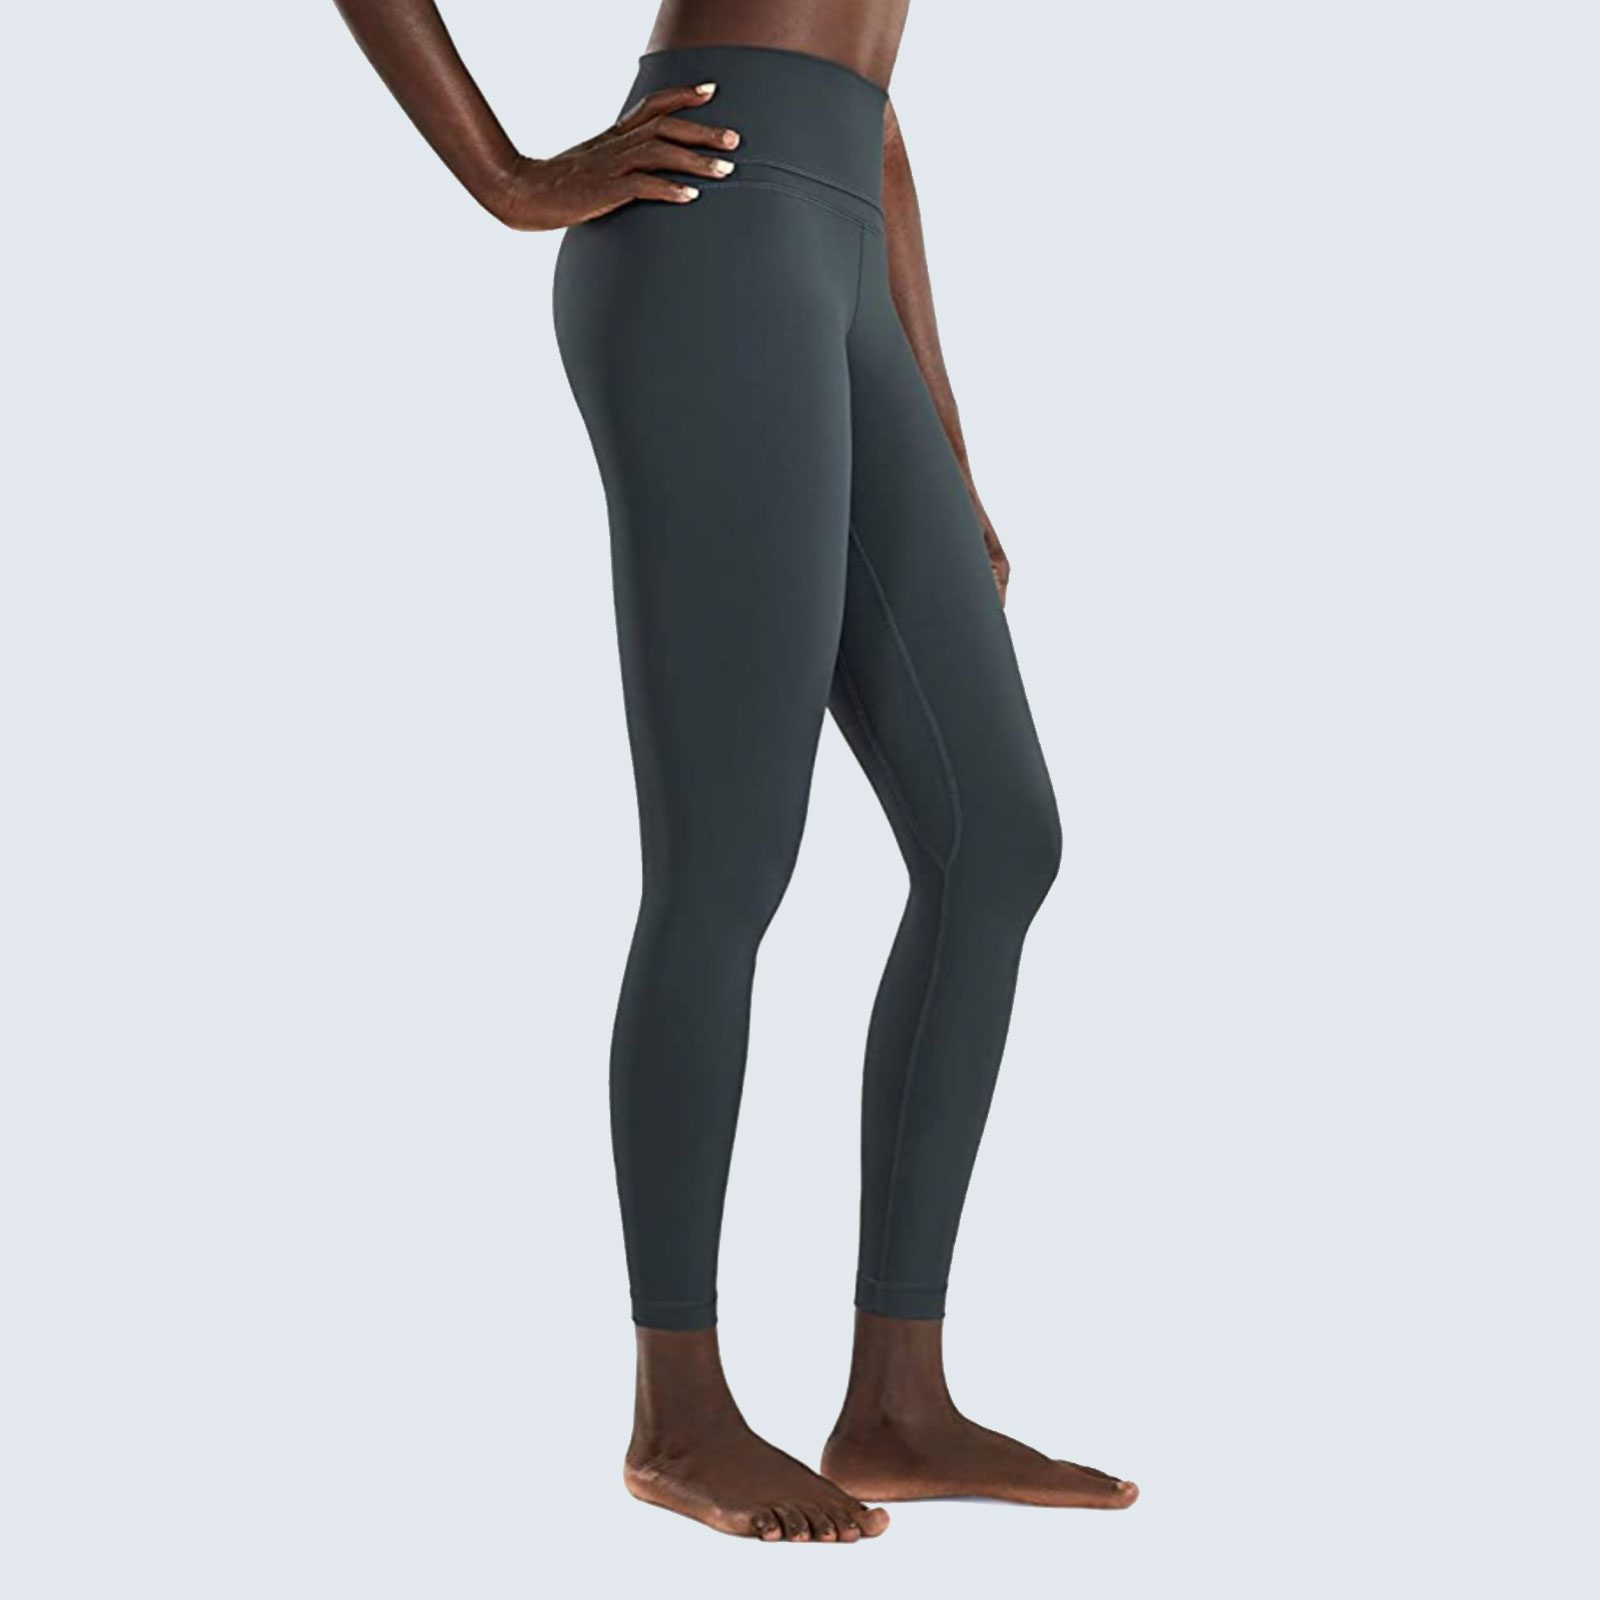 CRZ Yoga High Waisted Leggings